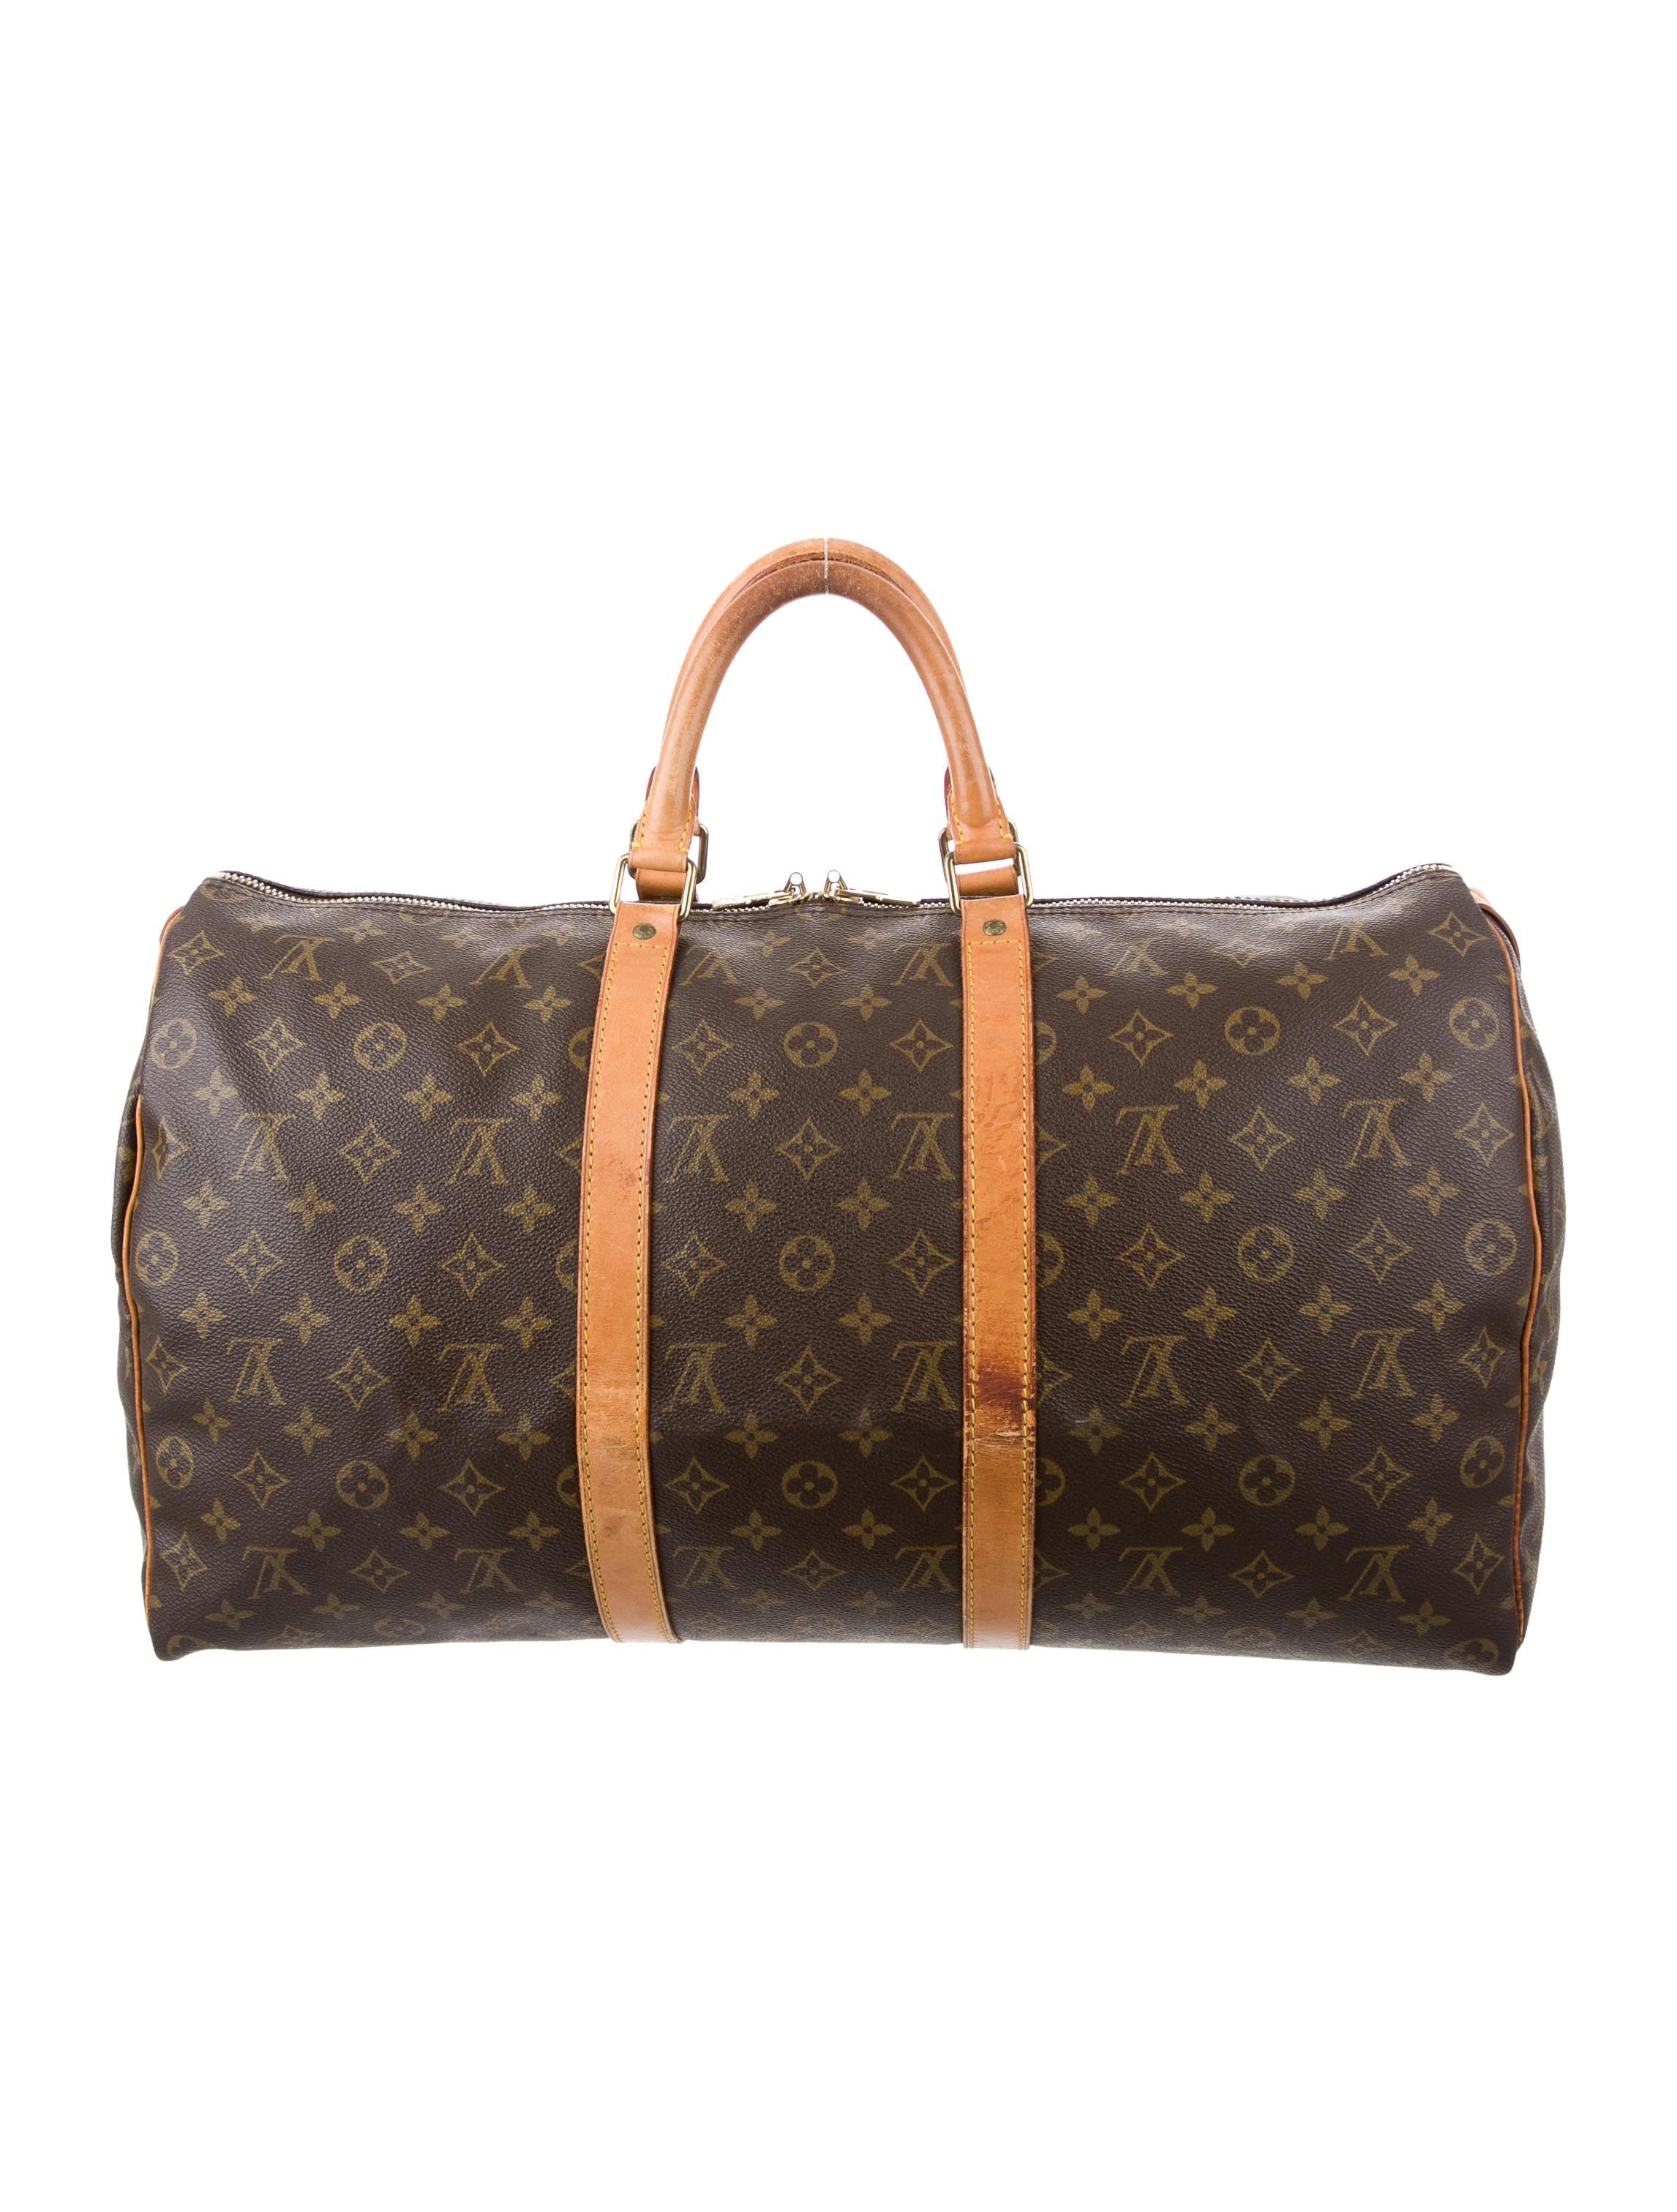 louis vuitton monogram keepall 50 handbags lou123832 the realreal. Black Bedroom Furniture Sets. Home Design Ideas